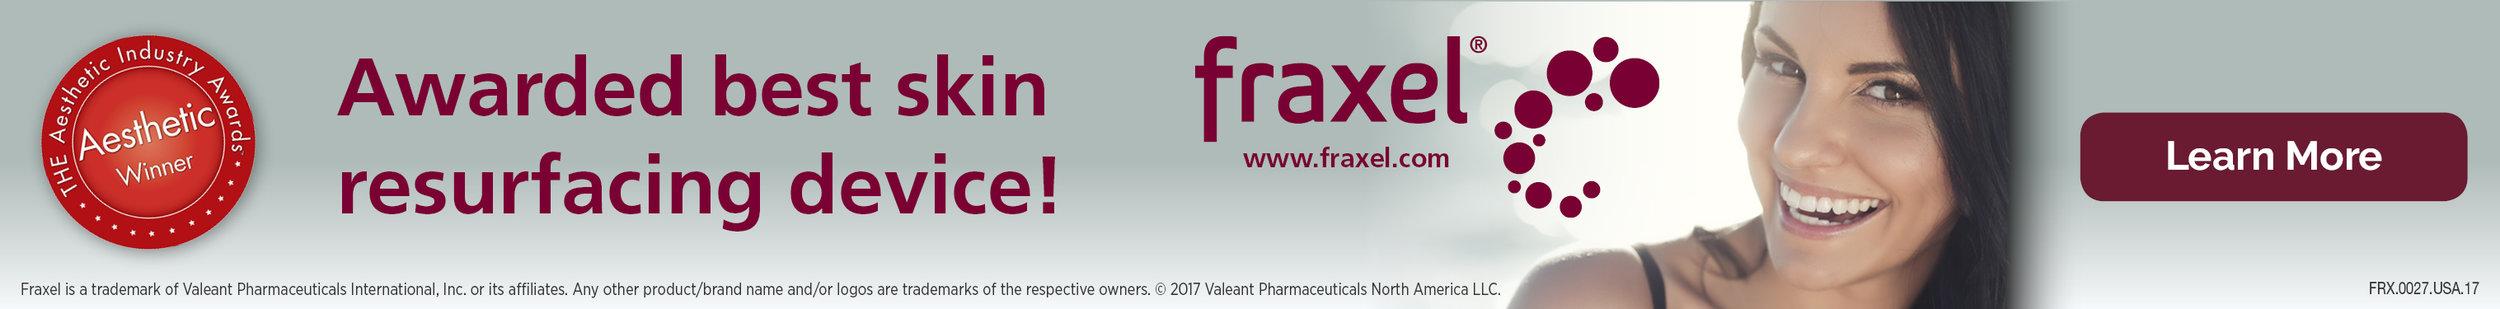 Fraxel Web Banner 728x90 FRX0027USA17.jpg